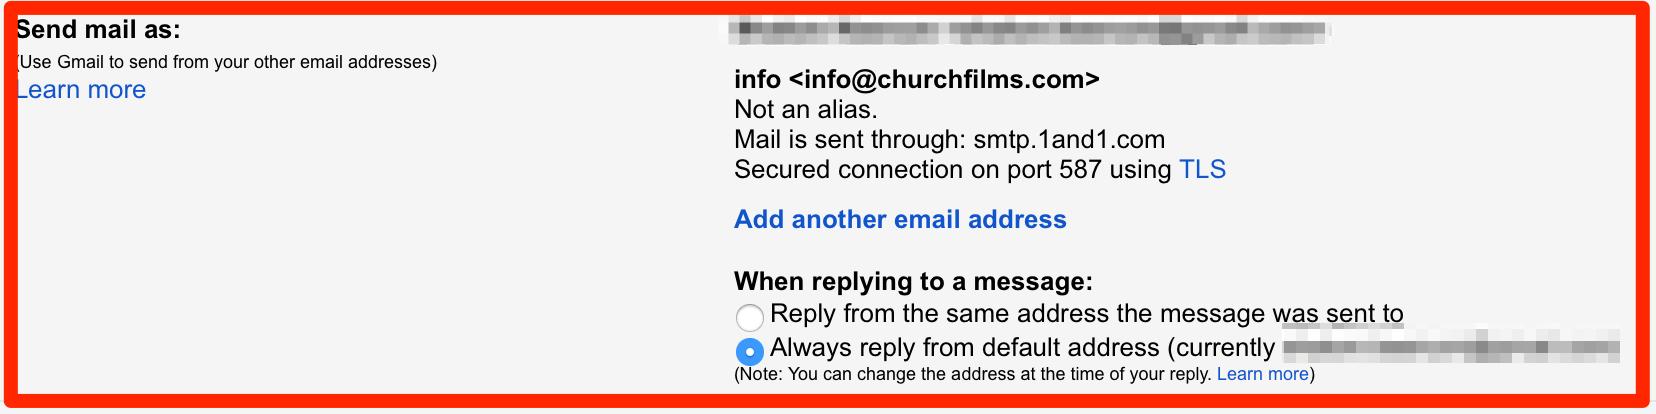 Microbudget-Film-email